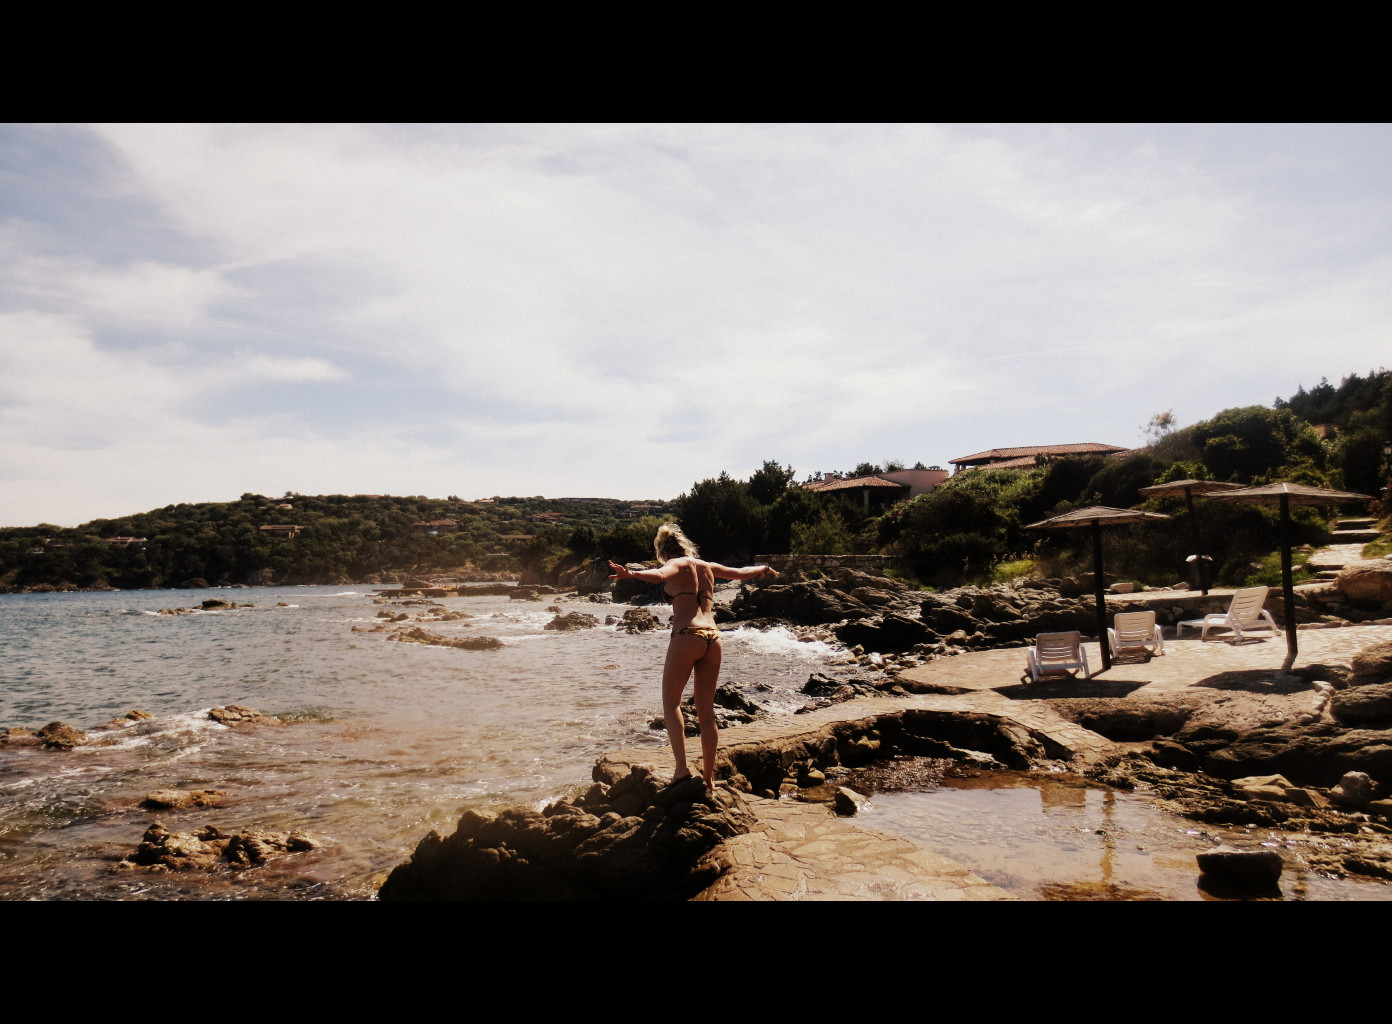 dejta svenska tjejer bikini